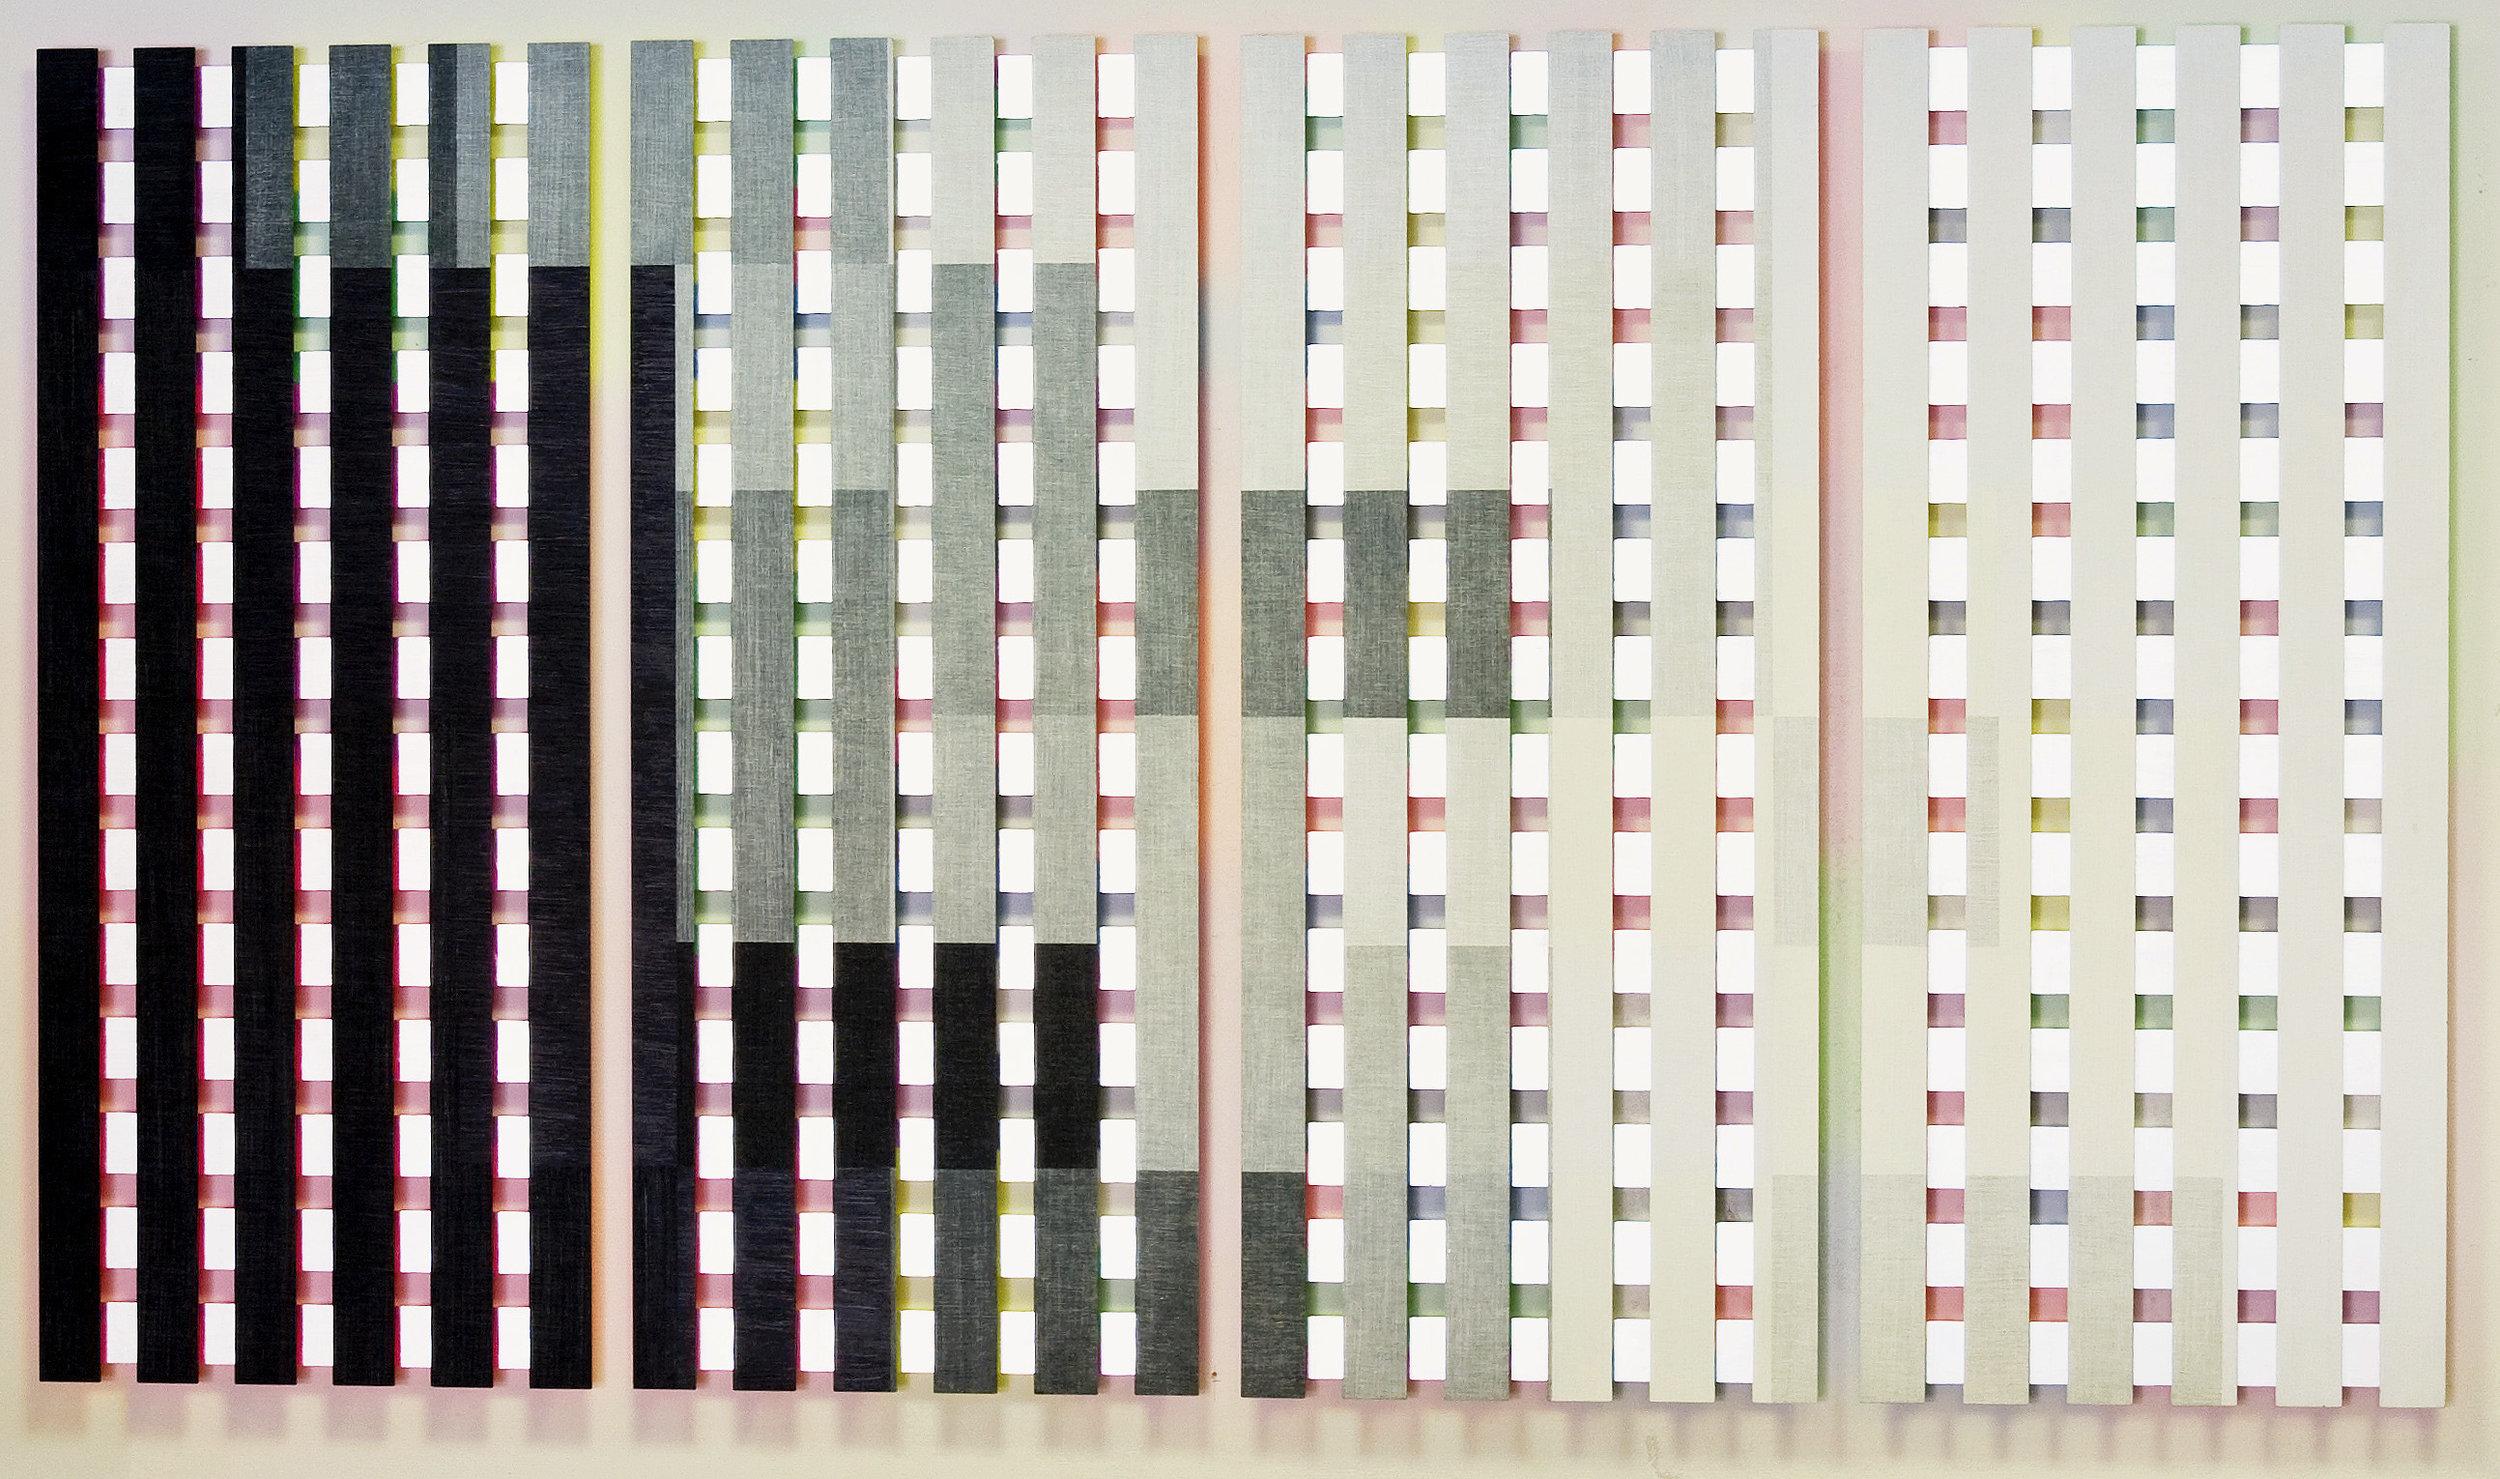 5j akril, les, 186 x 331 cm, 2010.jpg